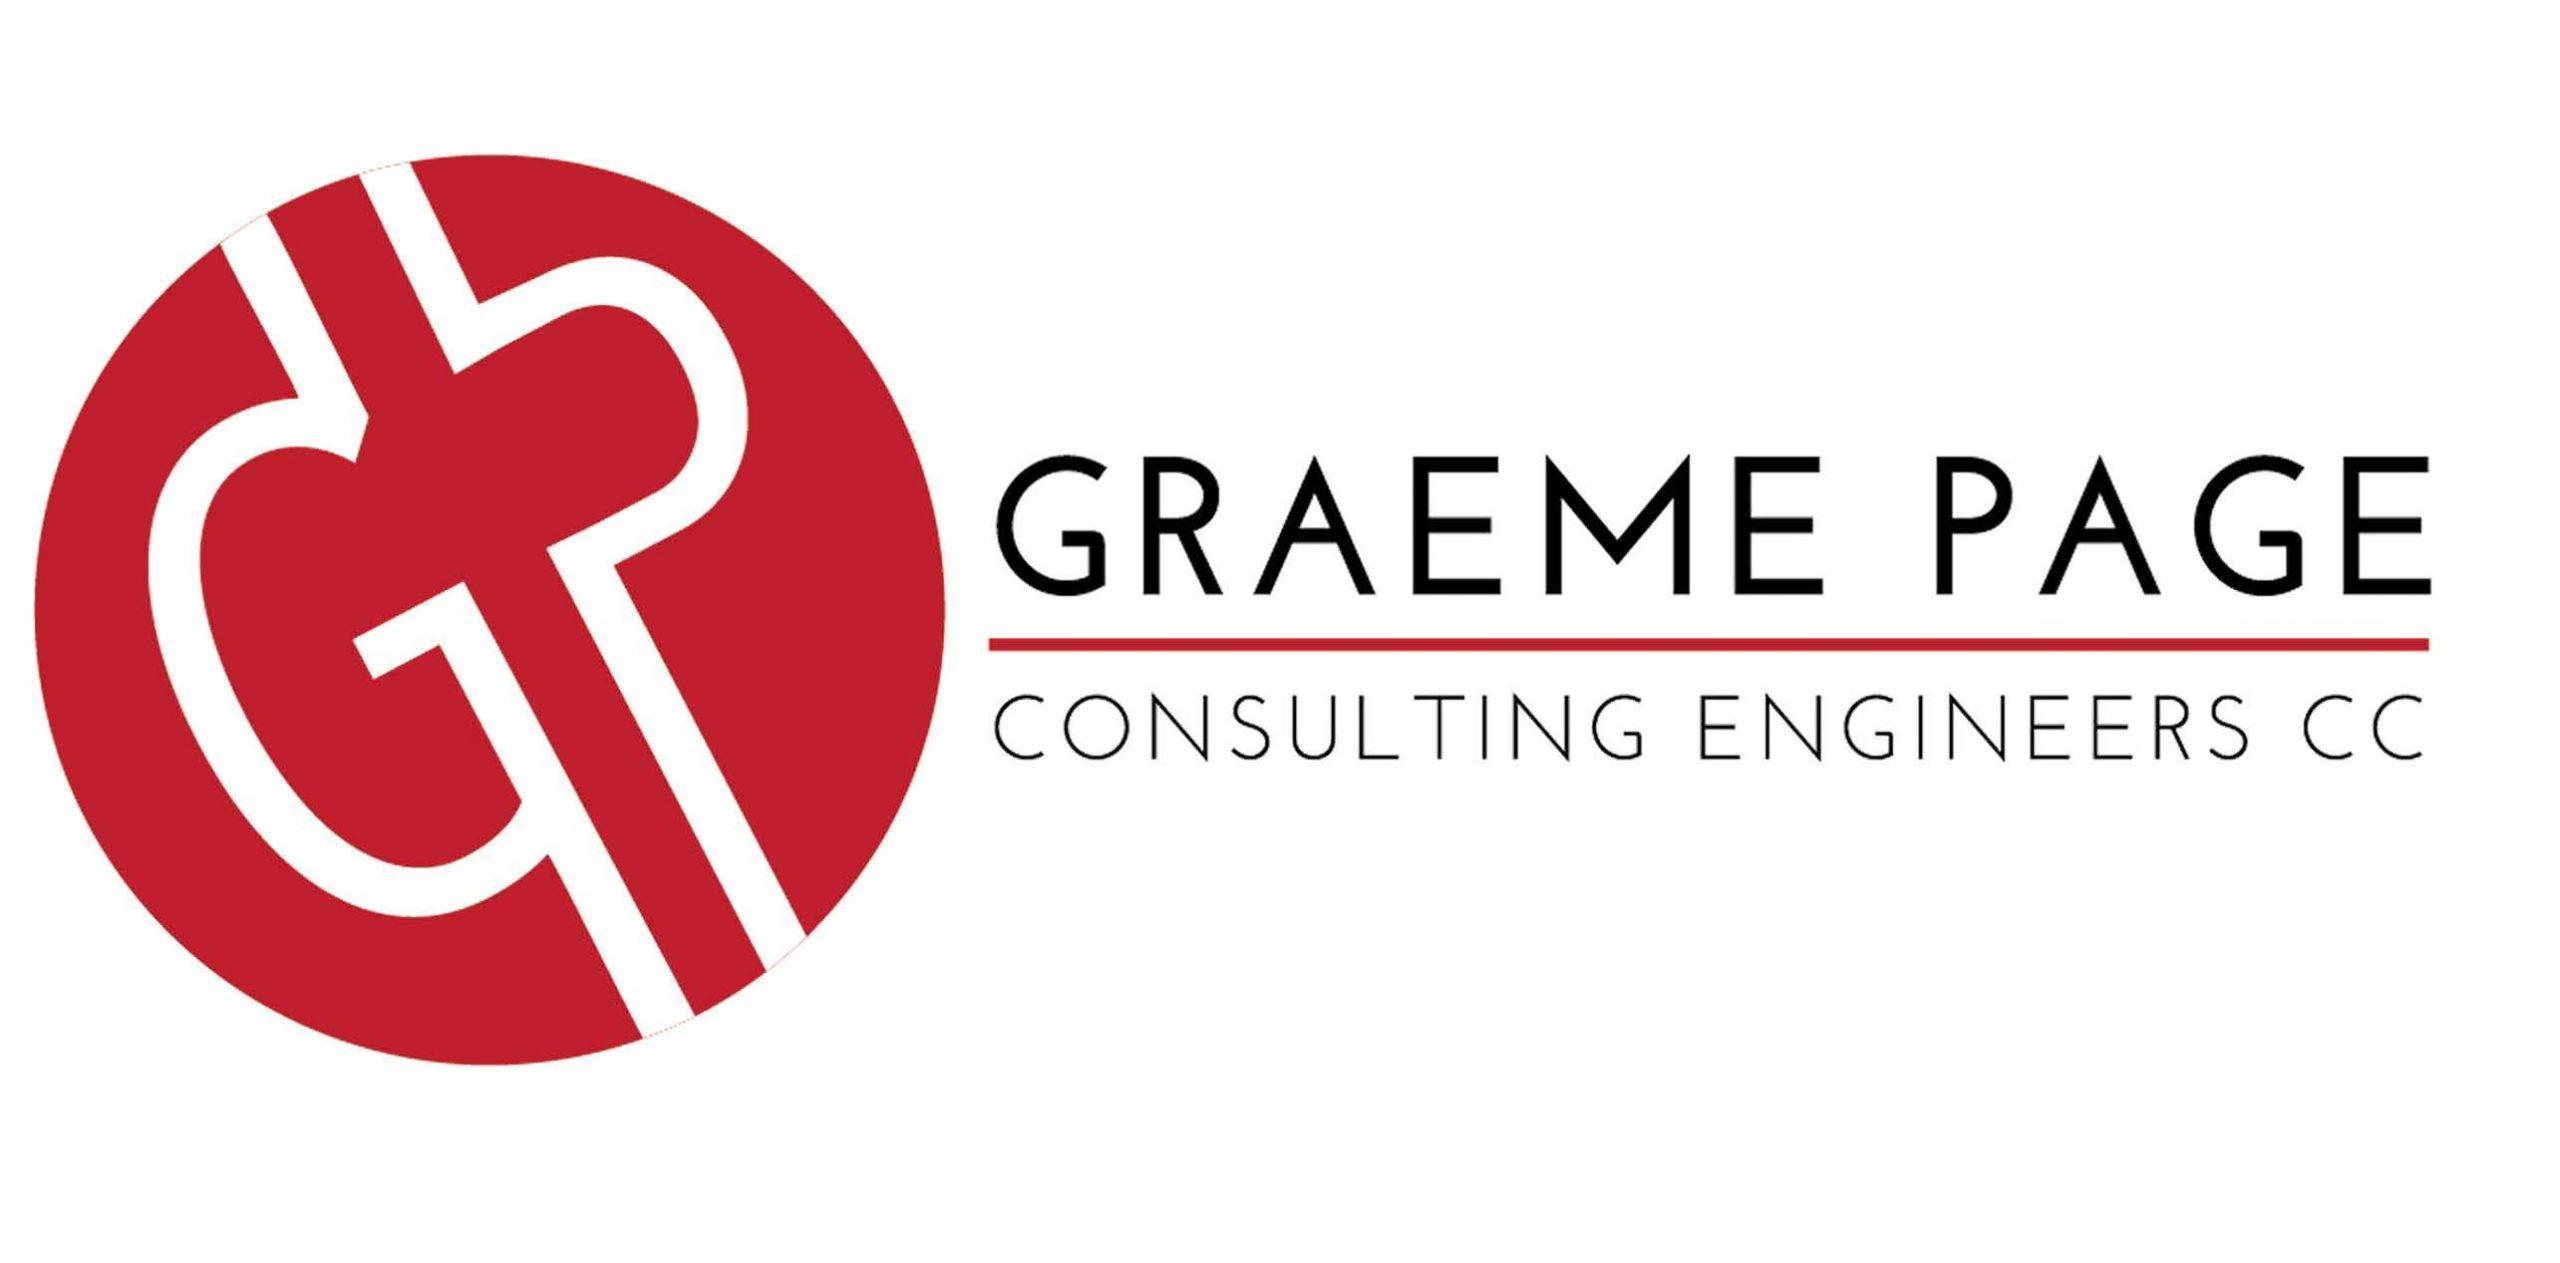 https://parkviewsquash.co.za/wp-content/uploads/2020/05/GPCE-Logo-scaled.jpg